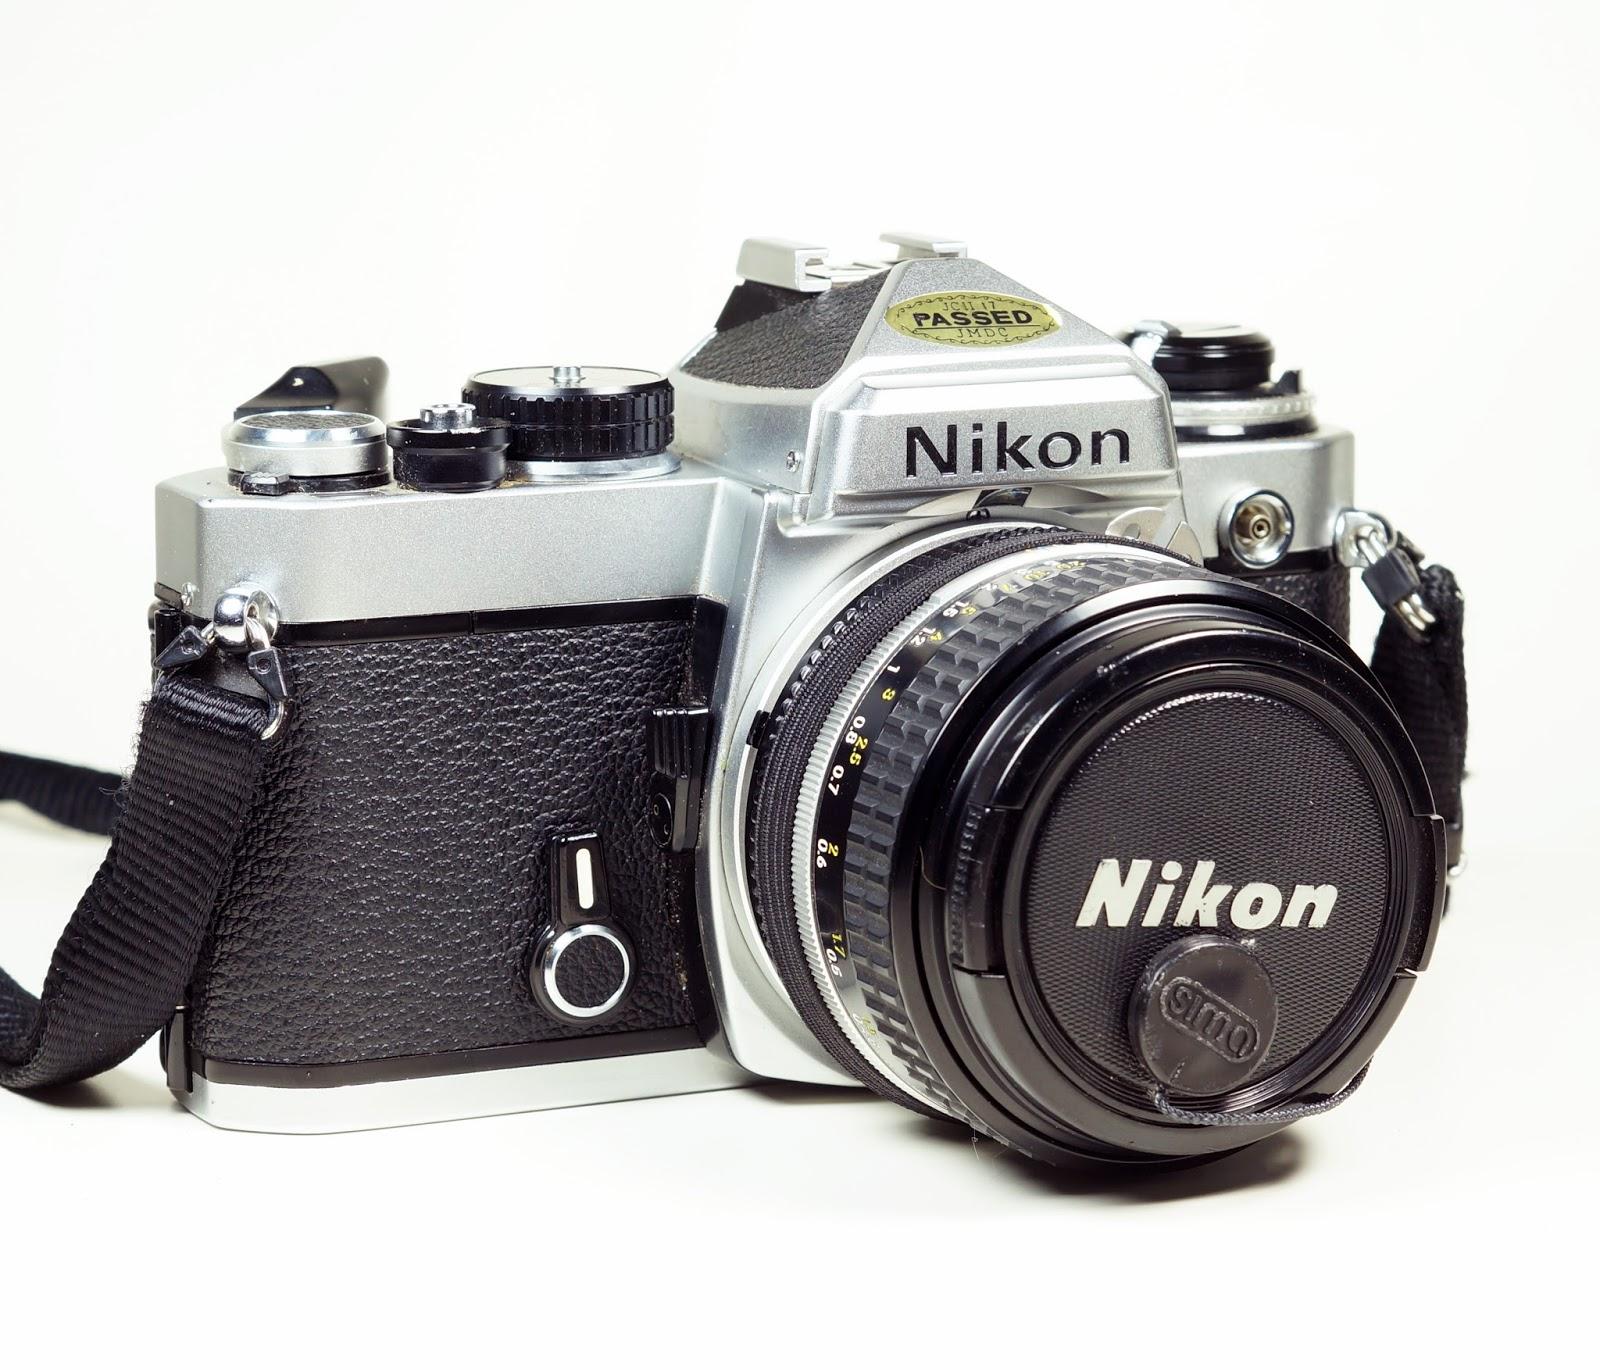 nikon fe 35mm slr film camera nikkor 50mm f 1 4 ai lens graphic trip rh graphictrip blogspot com nikon f2 manual nikon fe2 manual price